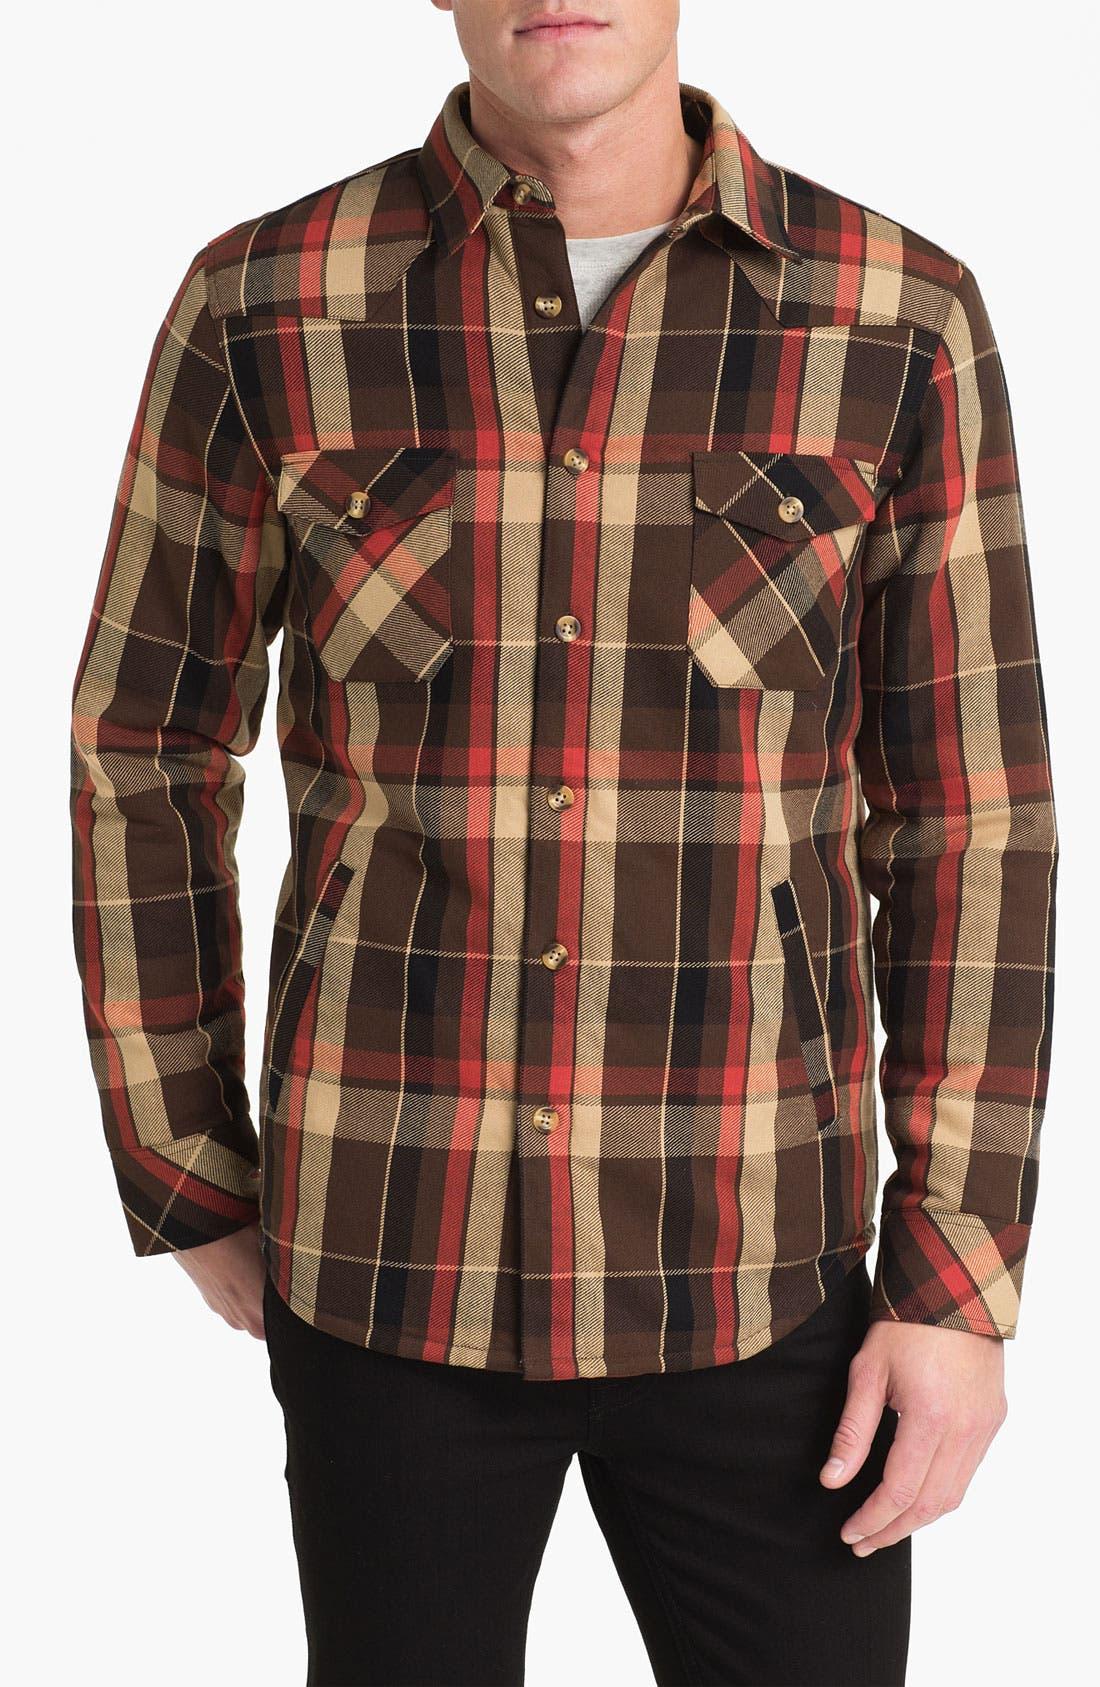 Main Image - Public Opinion Plaid Twill Western Shirt